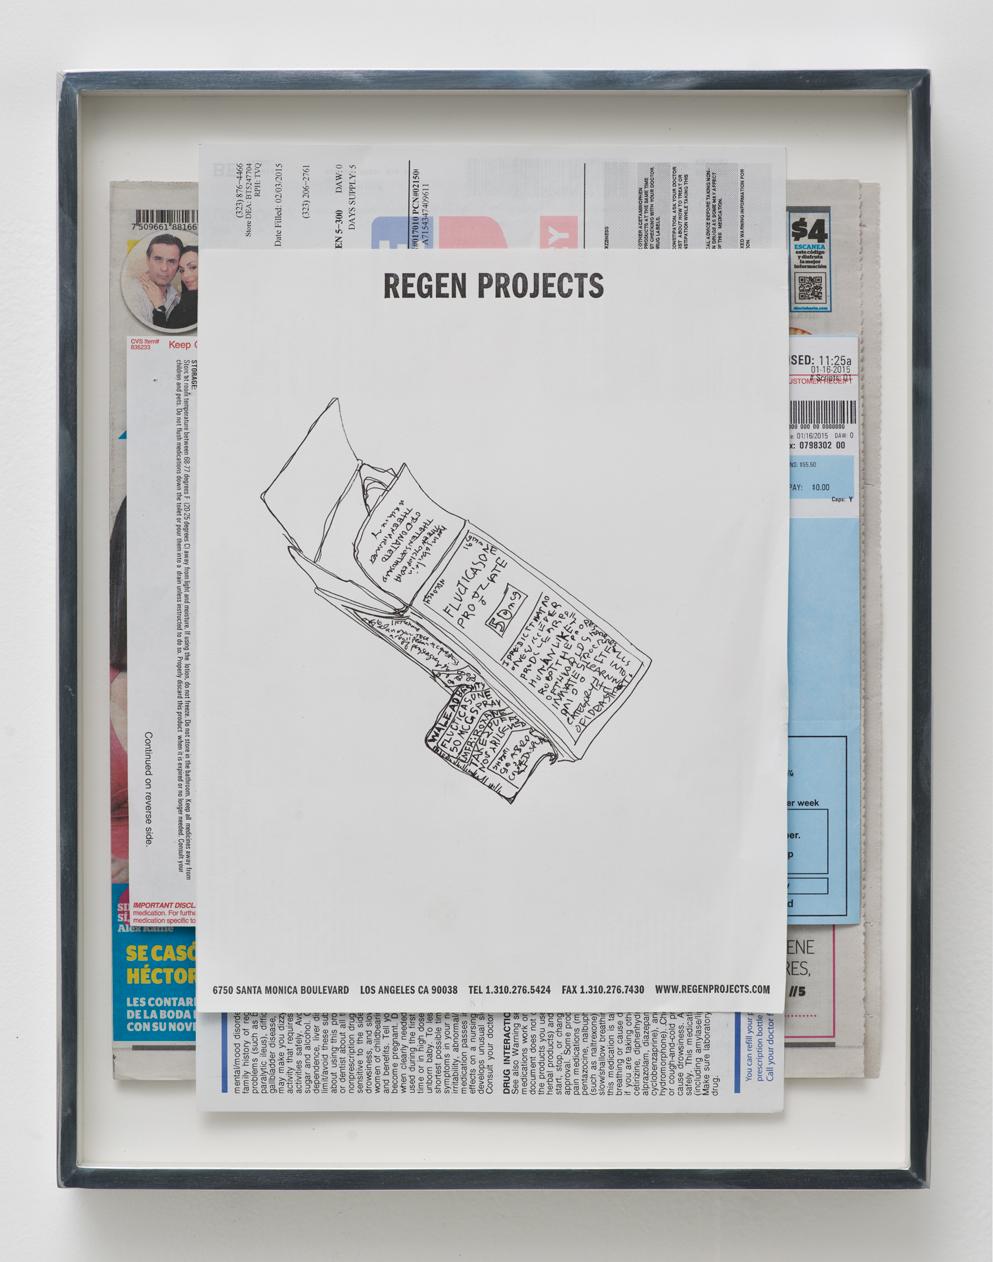 Fluticasone Propionate, 50 mcg, Spray, Boehringer Ingelheim, Roxane Laboratories, Inc.: Regen Projects, Los Angeles, California, Febraury 7, 2015   2015  Ink on letterhead, newspaper, ink on paper  15 x 11 1/2 inches   Drawings, 2014–    Walid AlBeshti, 2015